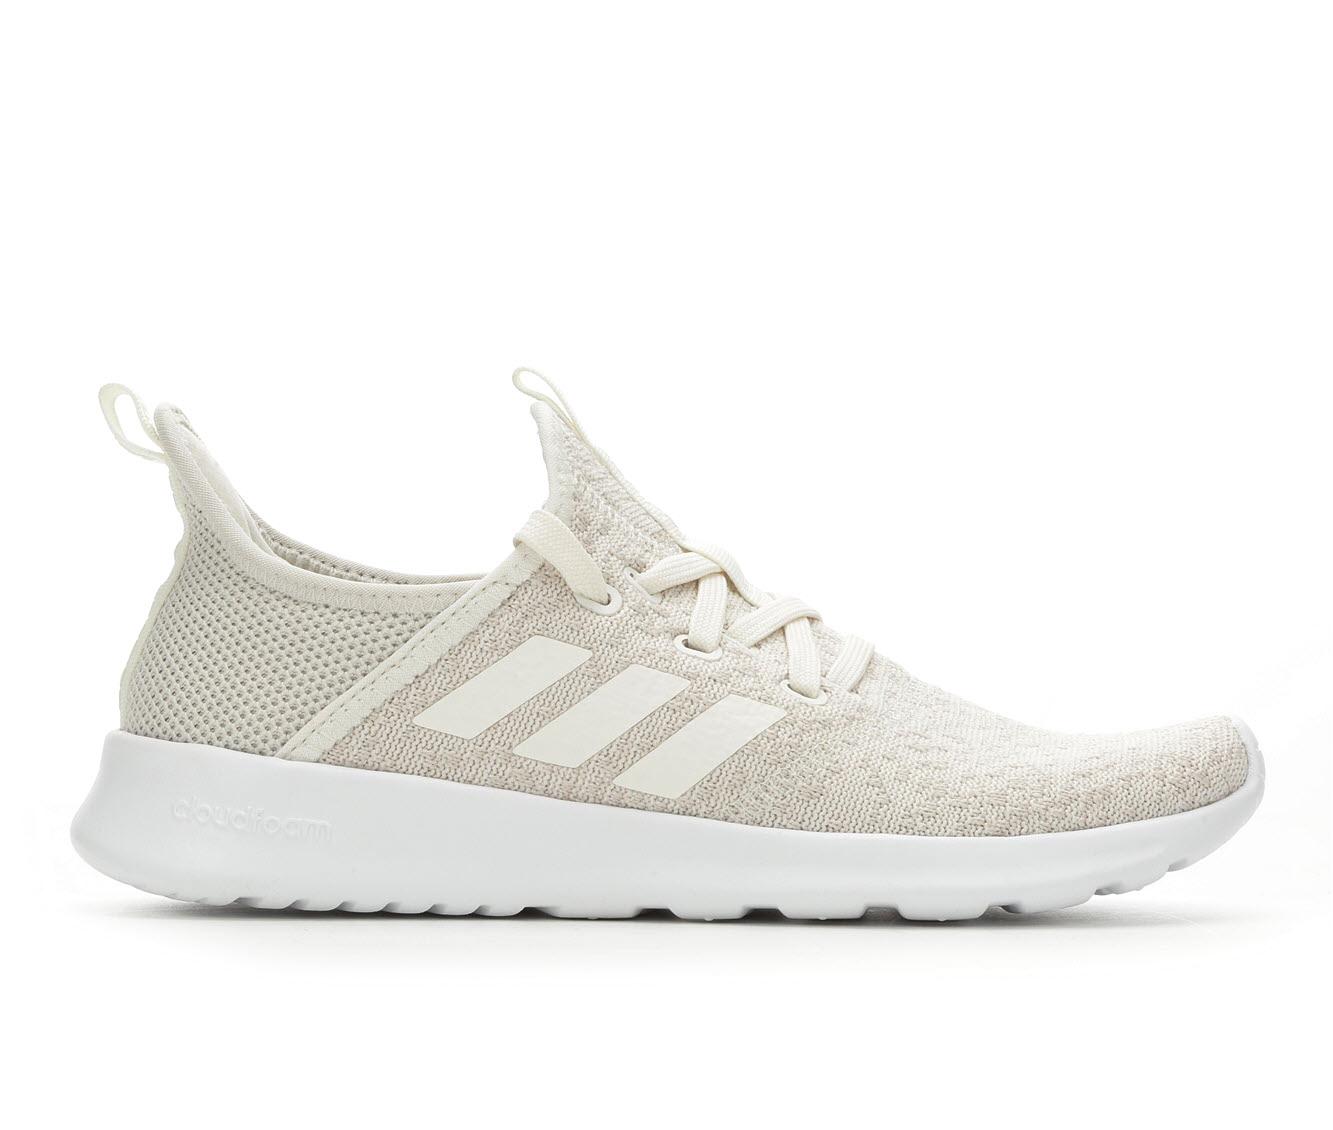 Adidas Pure Women's Athletic Shoe (White)